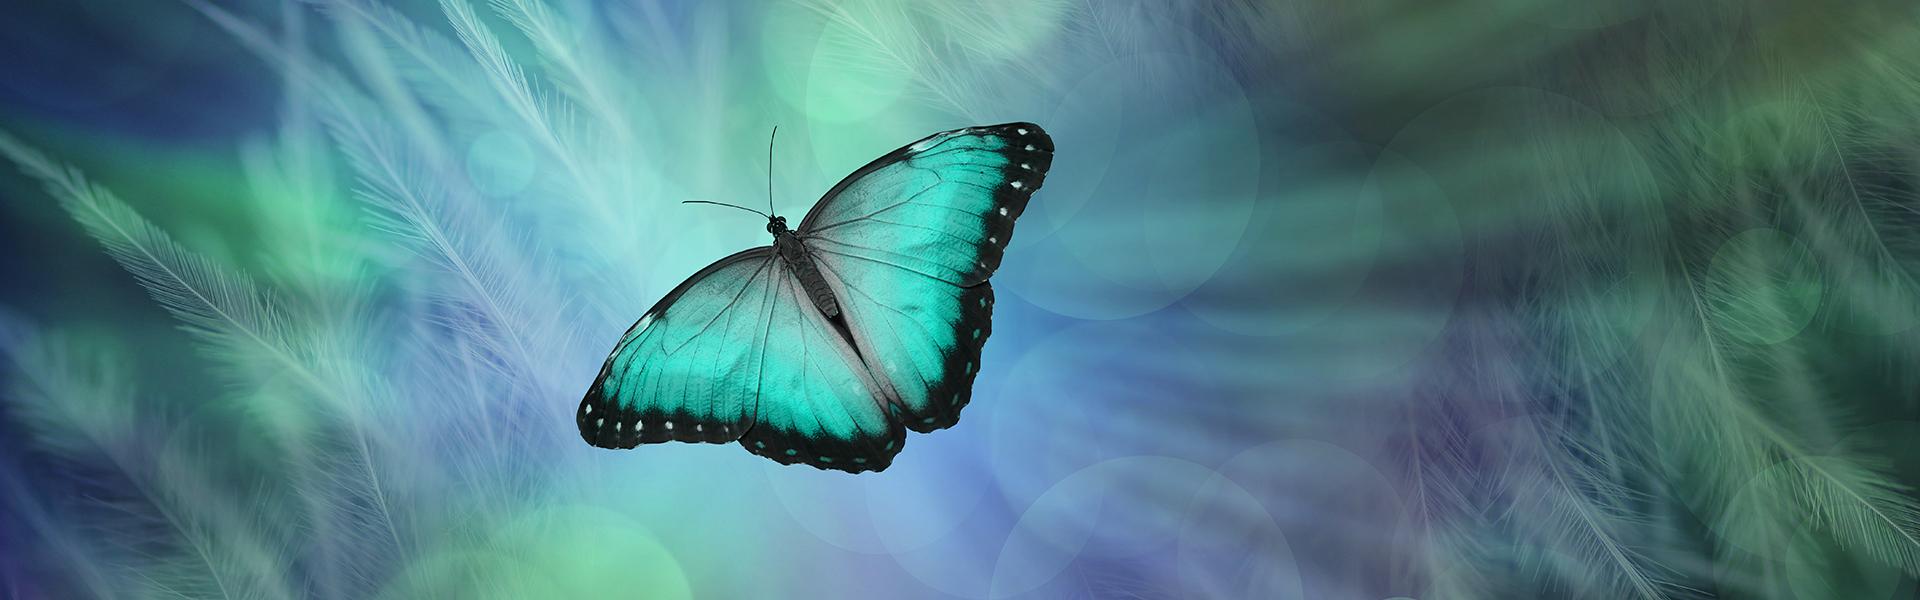 blog-charlyn-spitzer-psychic-medium-services